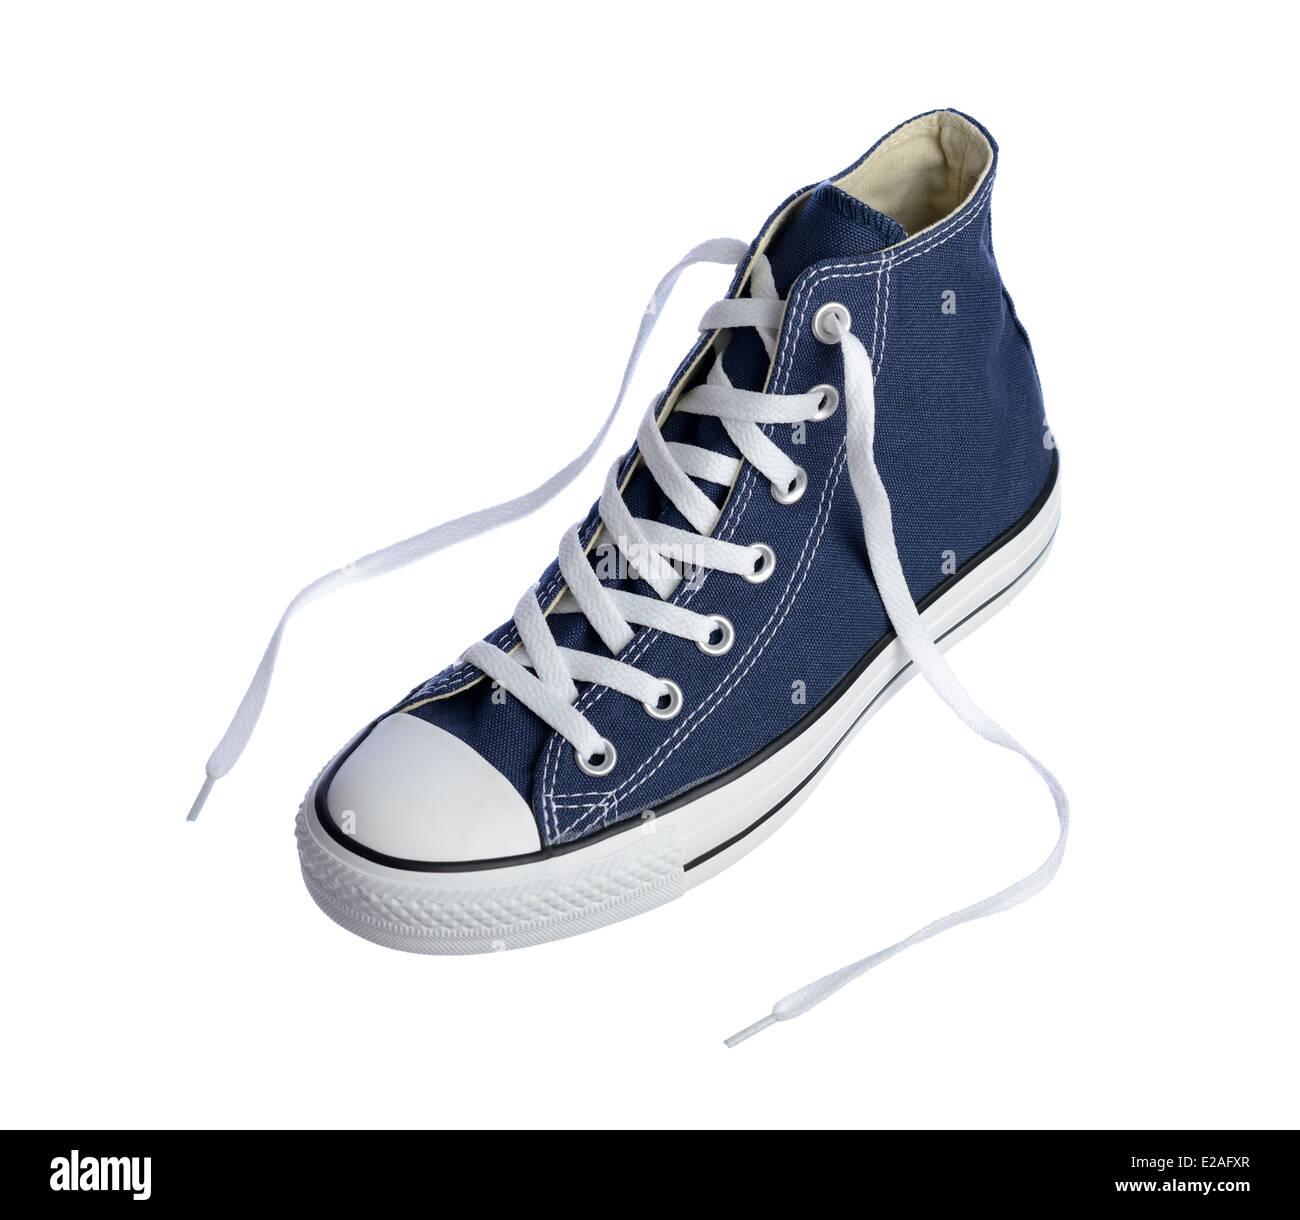 Converse Schuh Stockfotos & Converse Schuh Bilder Alamy